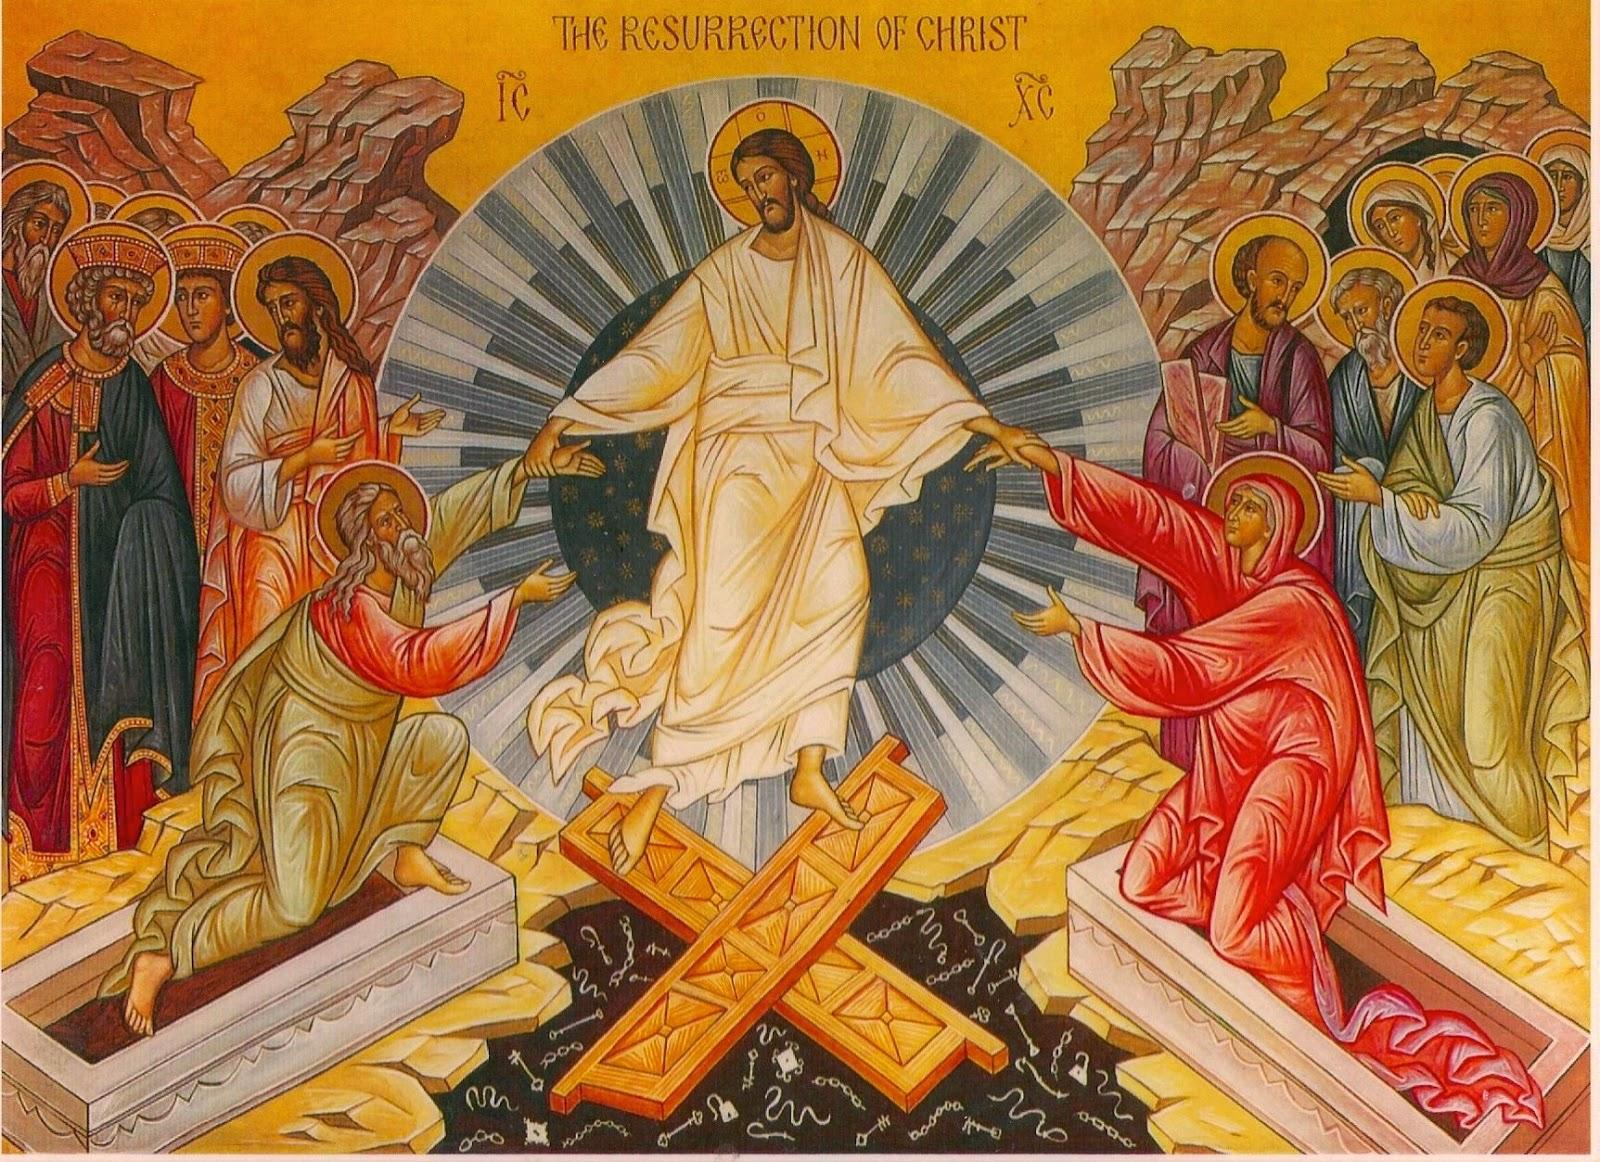 http://4.bp.blogspot.com/-ymGp41ks958/VR7B6wPcJzI/AAAAAAAABxY/GiiBrfTvlOk/s1600/resurrection-of-christ-icon.jpg